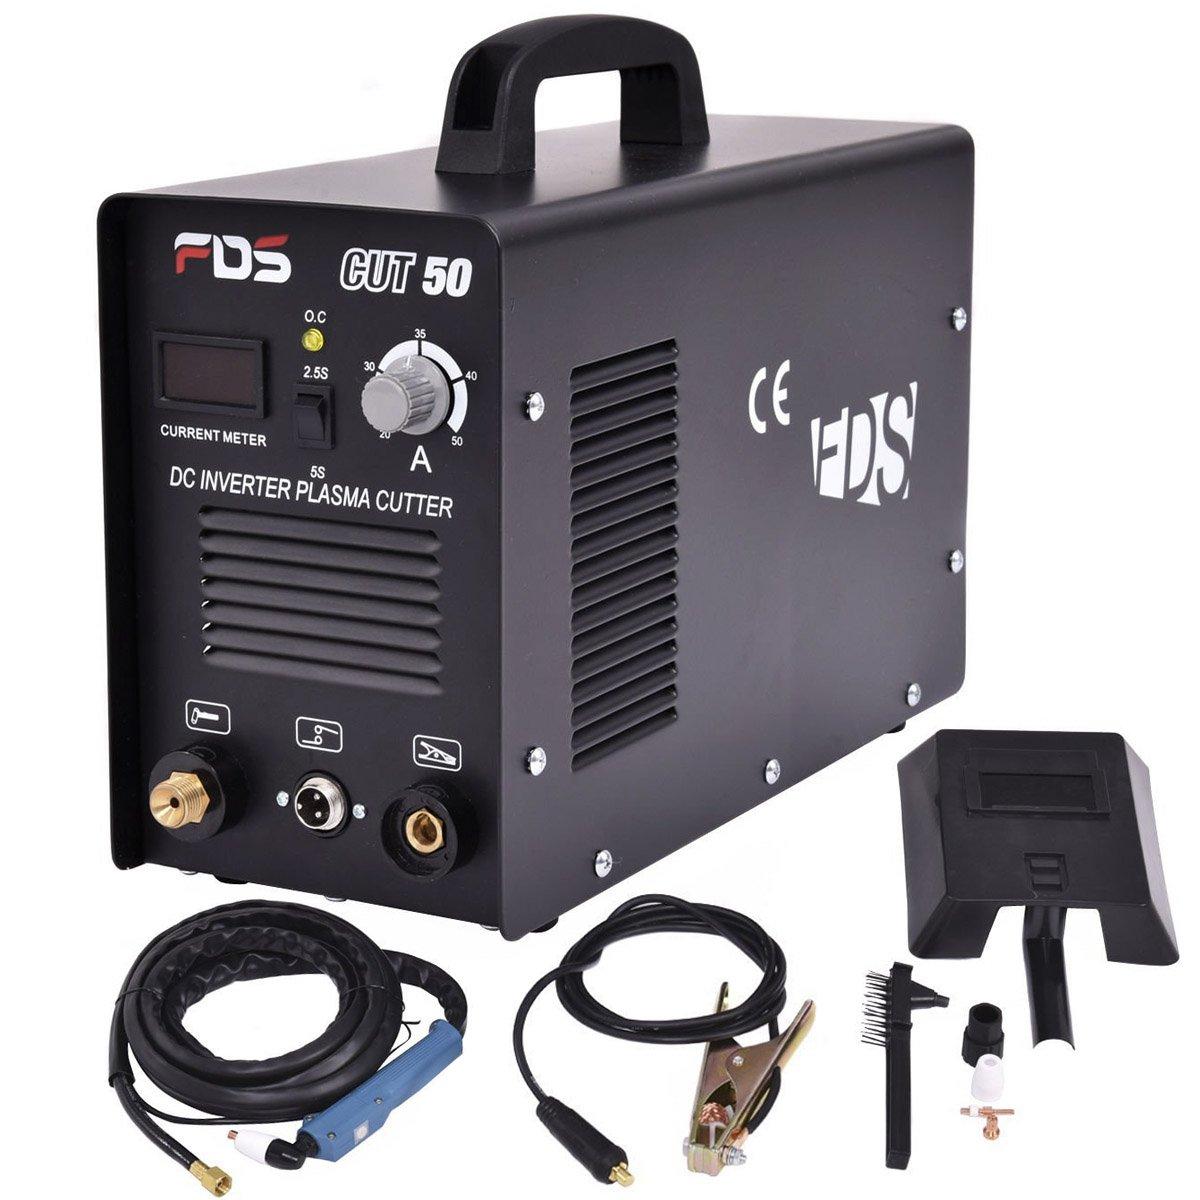 Goplus Cut Electric Plasma Cutter DC